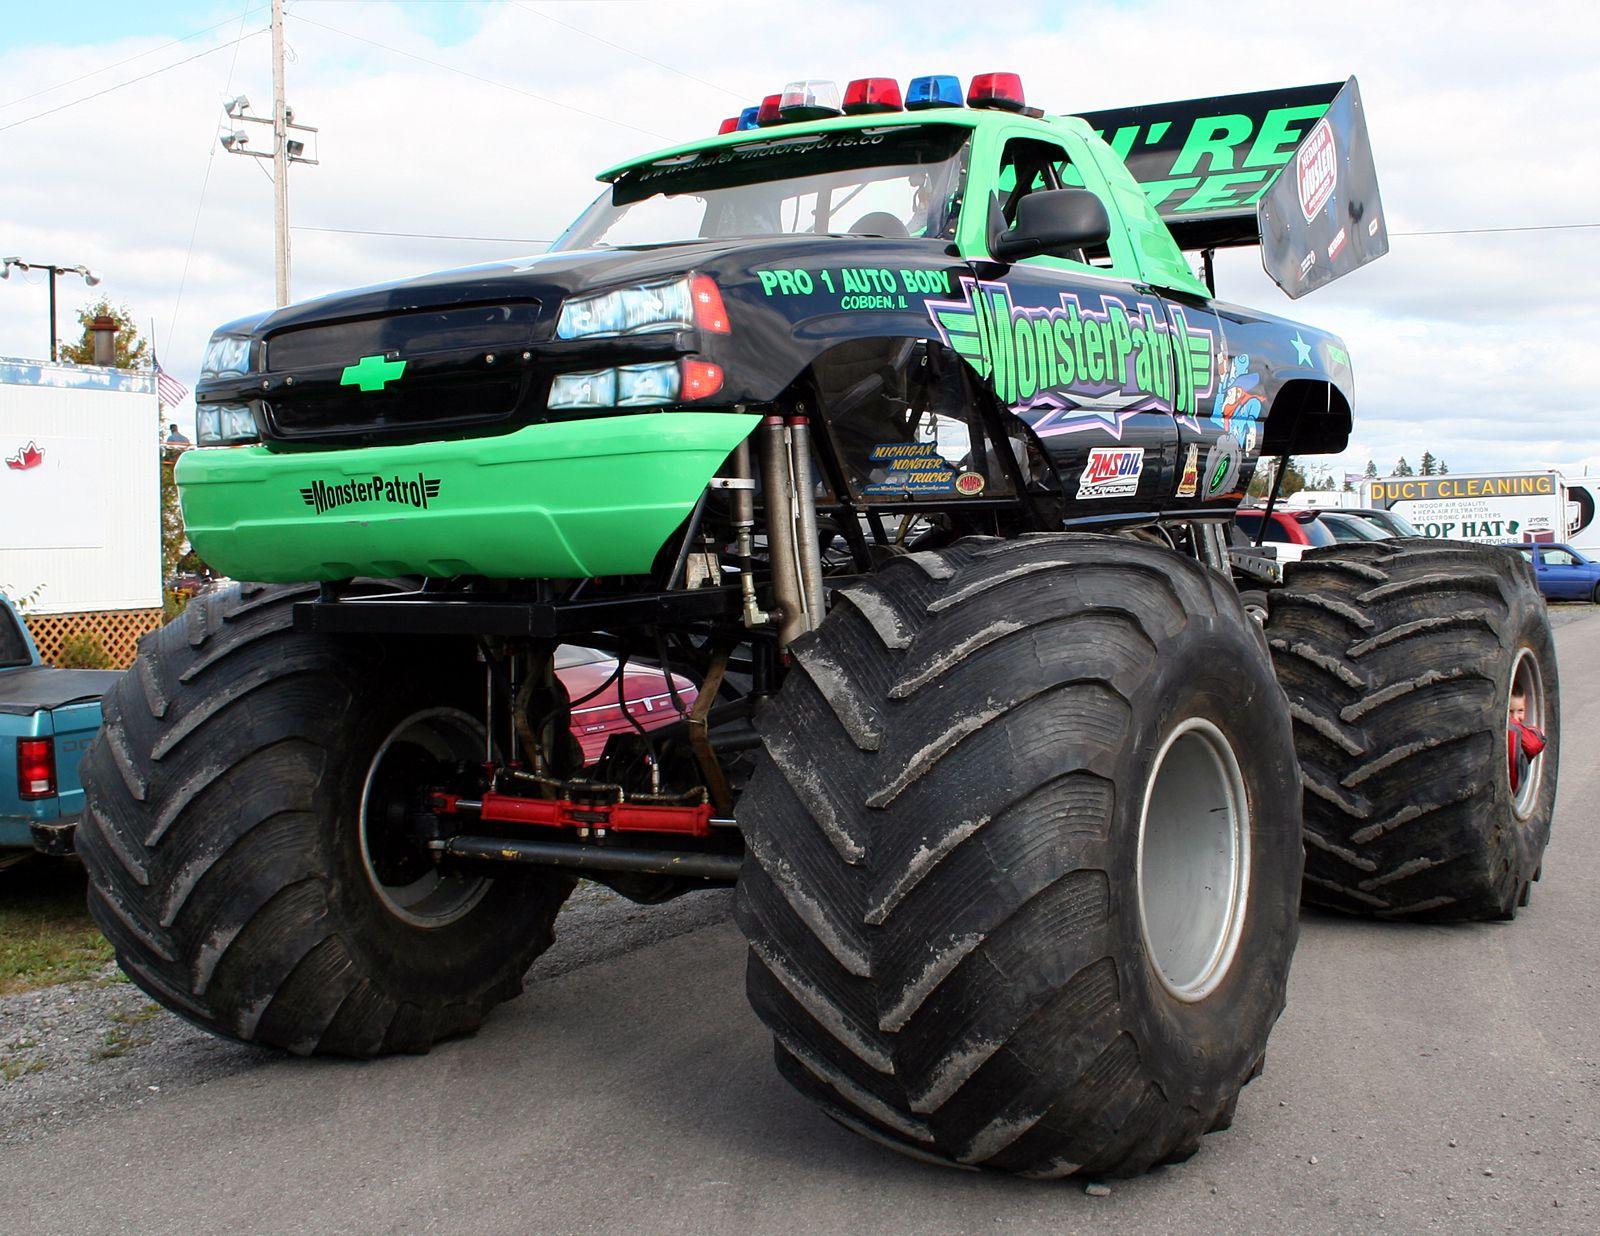 awesome trucks hd - photo #26